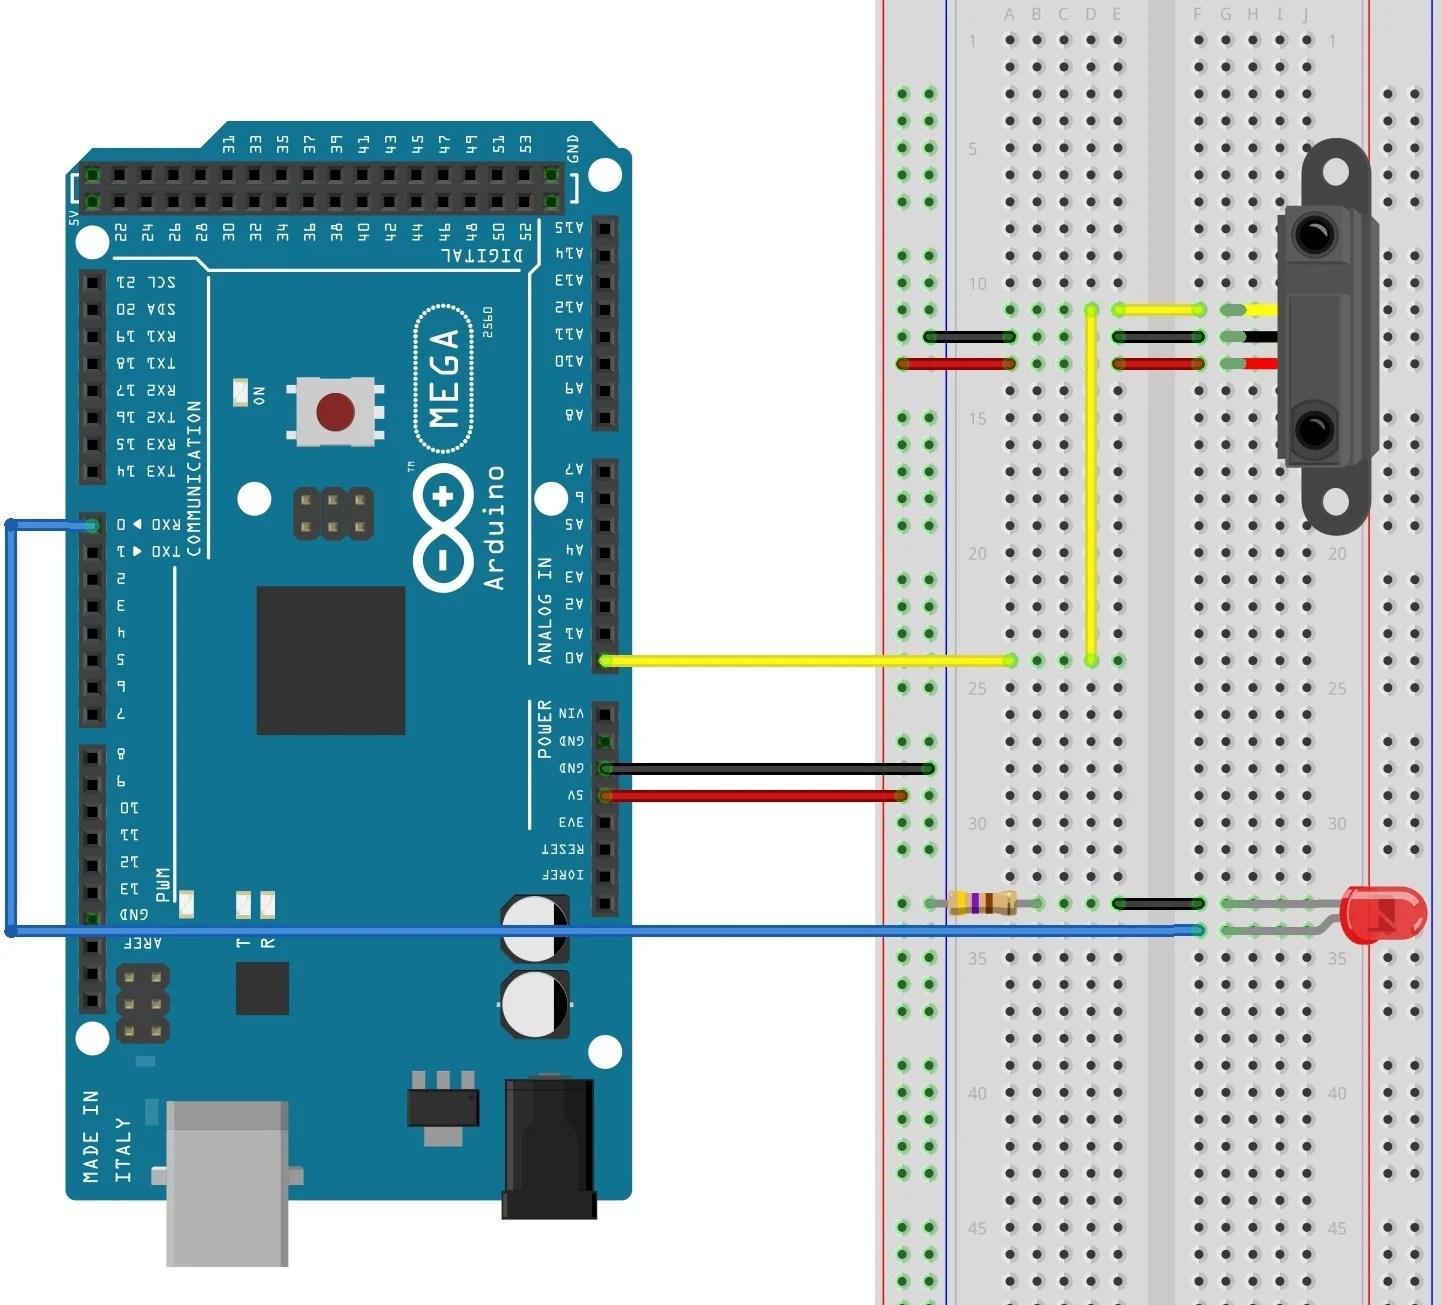 hight resolution of inductive proximity sensor wiring diagram pinout wiring diagraminductive proximity sensor wiring diagram pinout wiring librarycircuit diagram